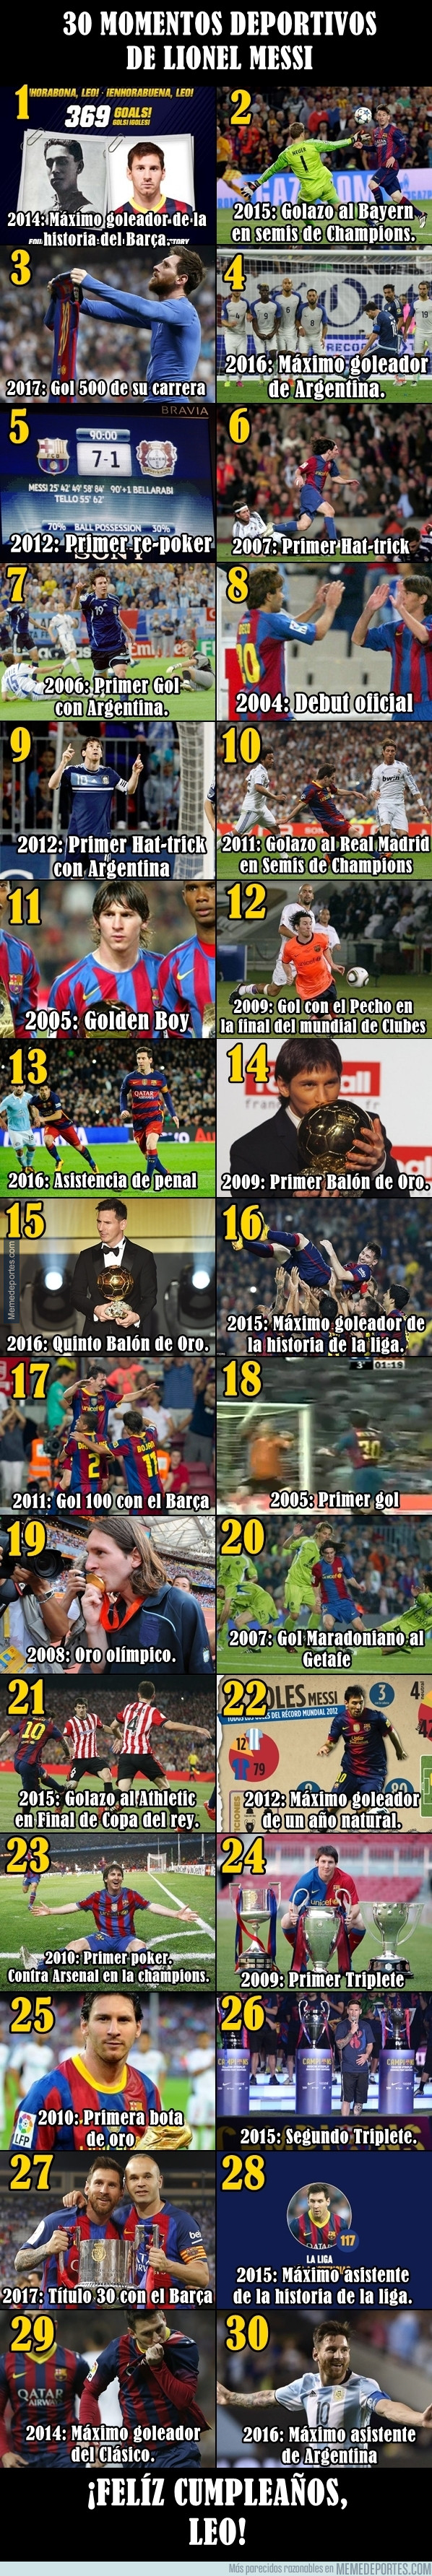 983426 - 30 Momentos inmessionantes de Messi